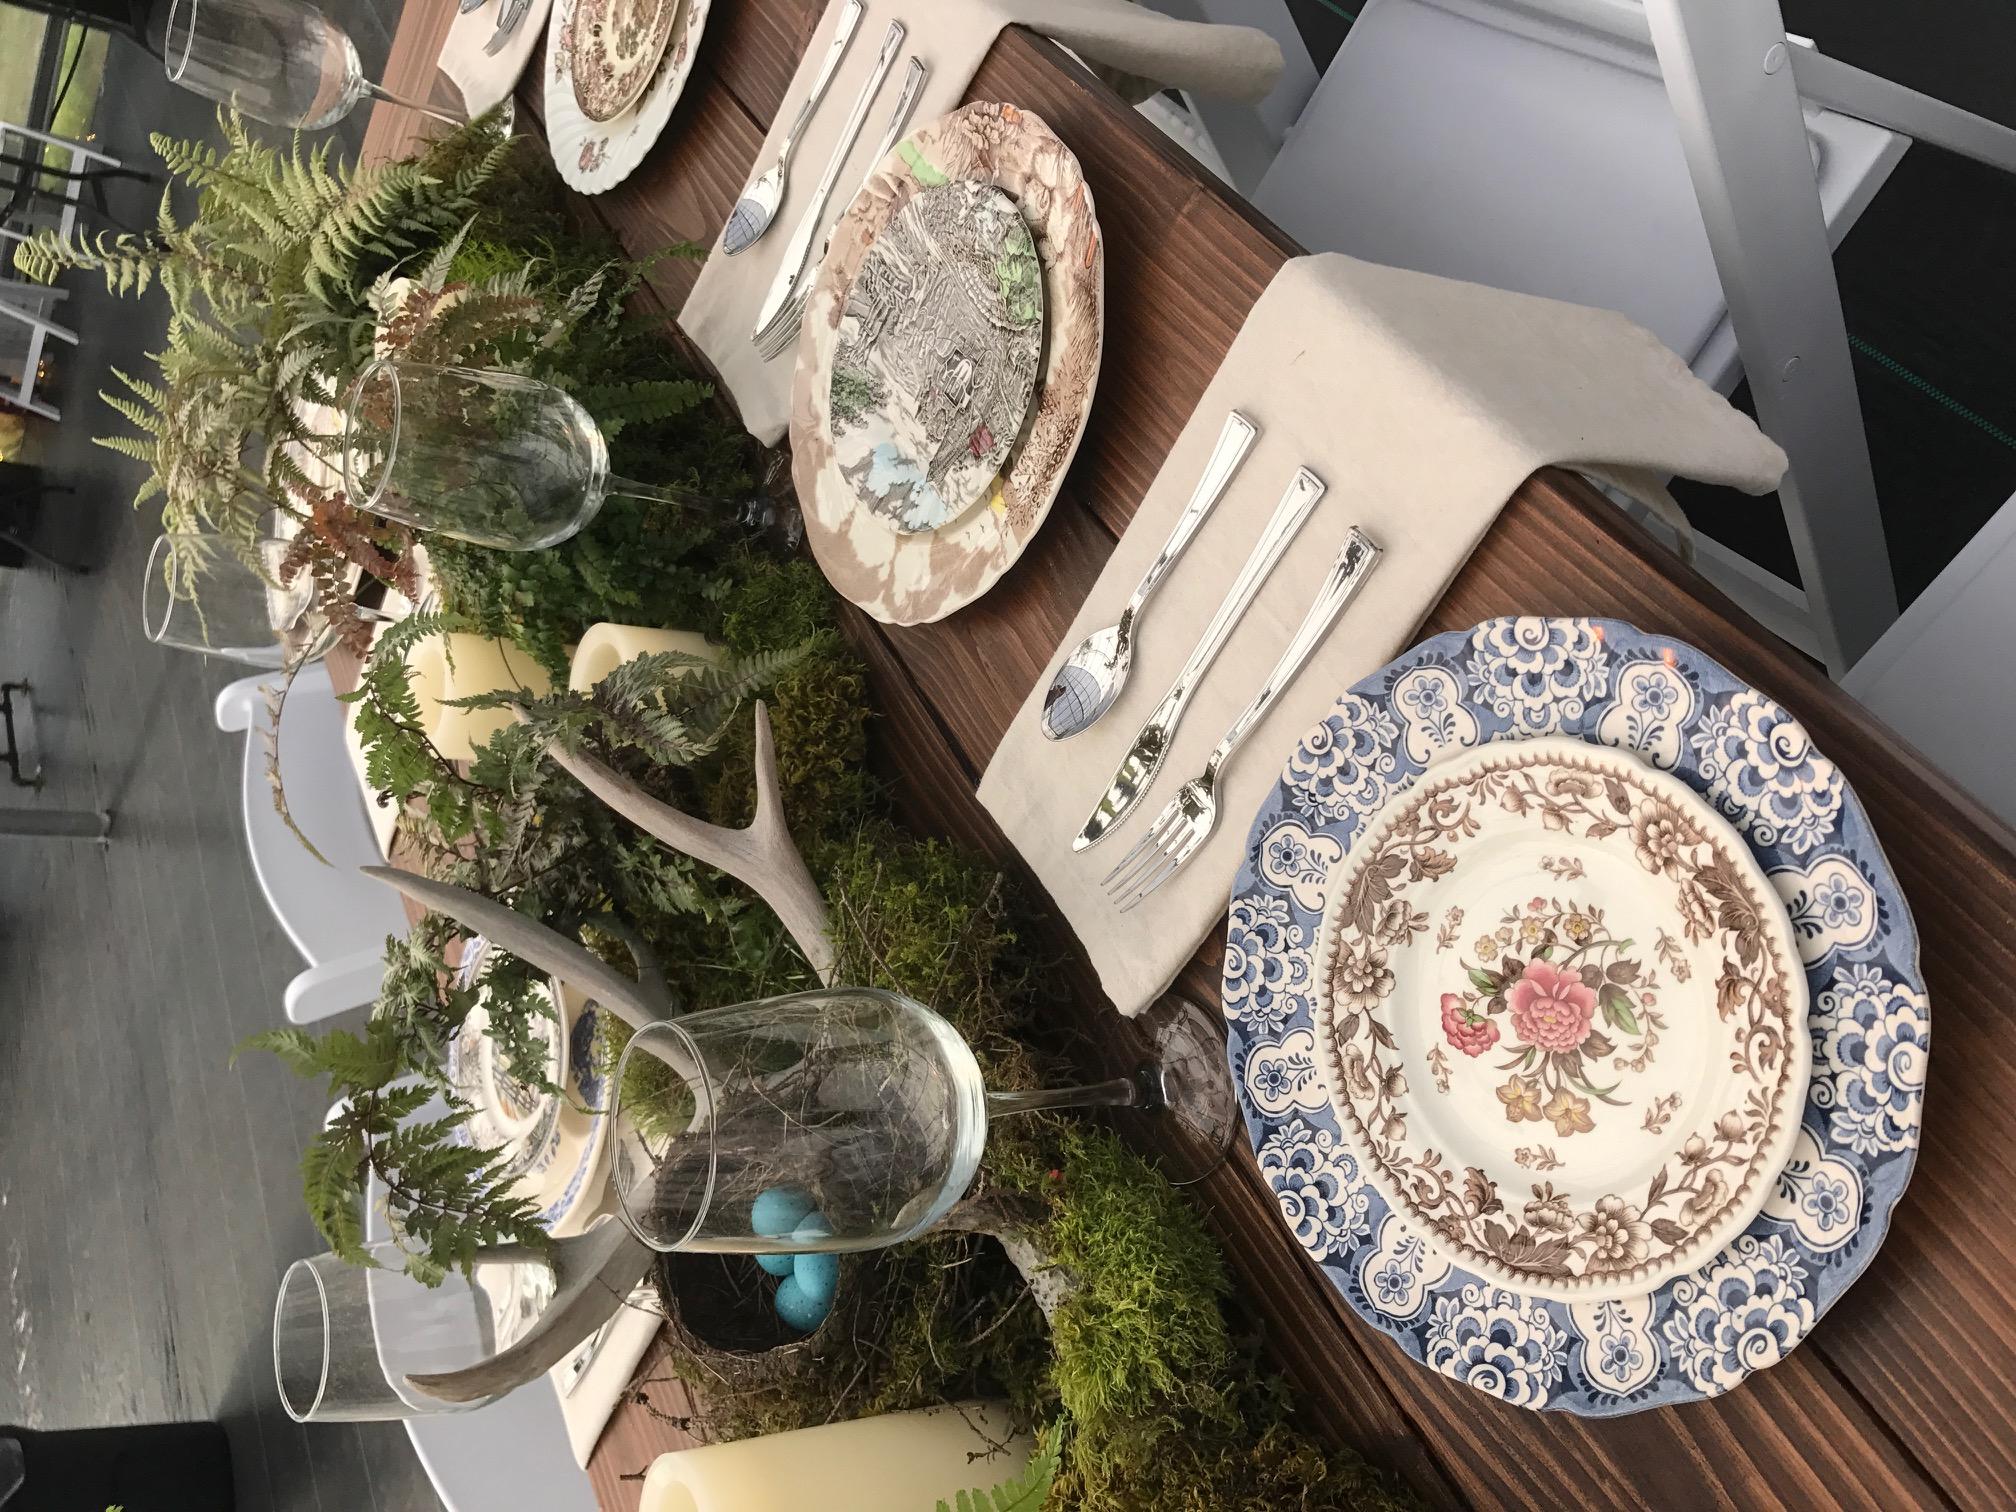 Moss/Fern plantings, Farm tables